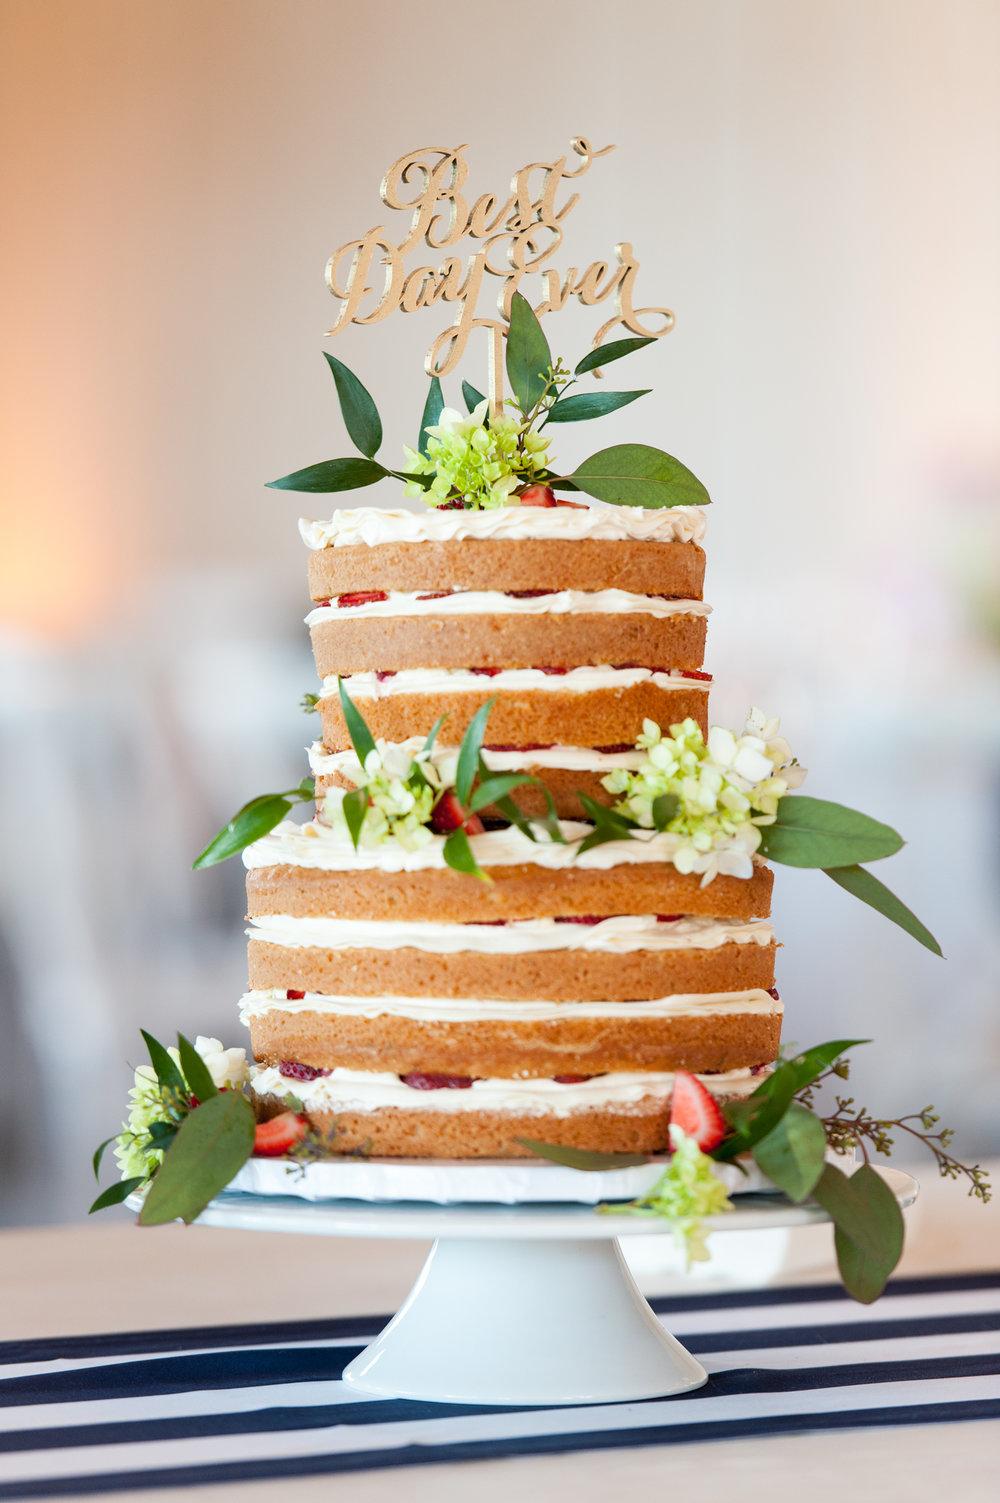 Strawberry Shortcake_Cornerstone_Sonoma Wedding cake.jpg